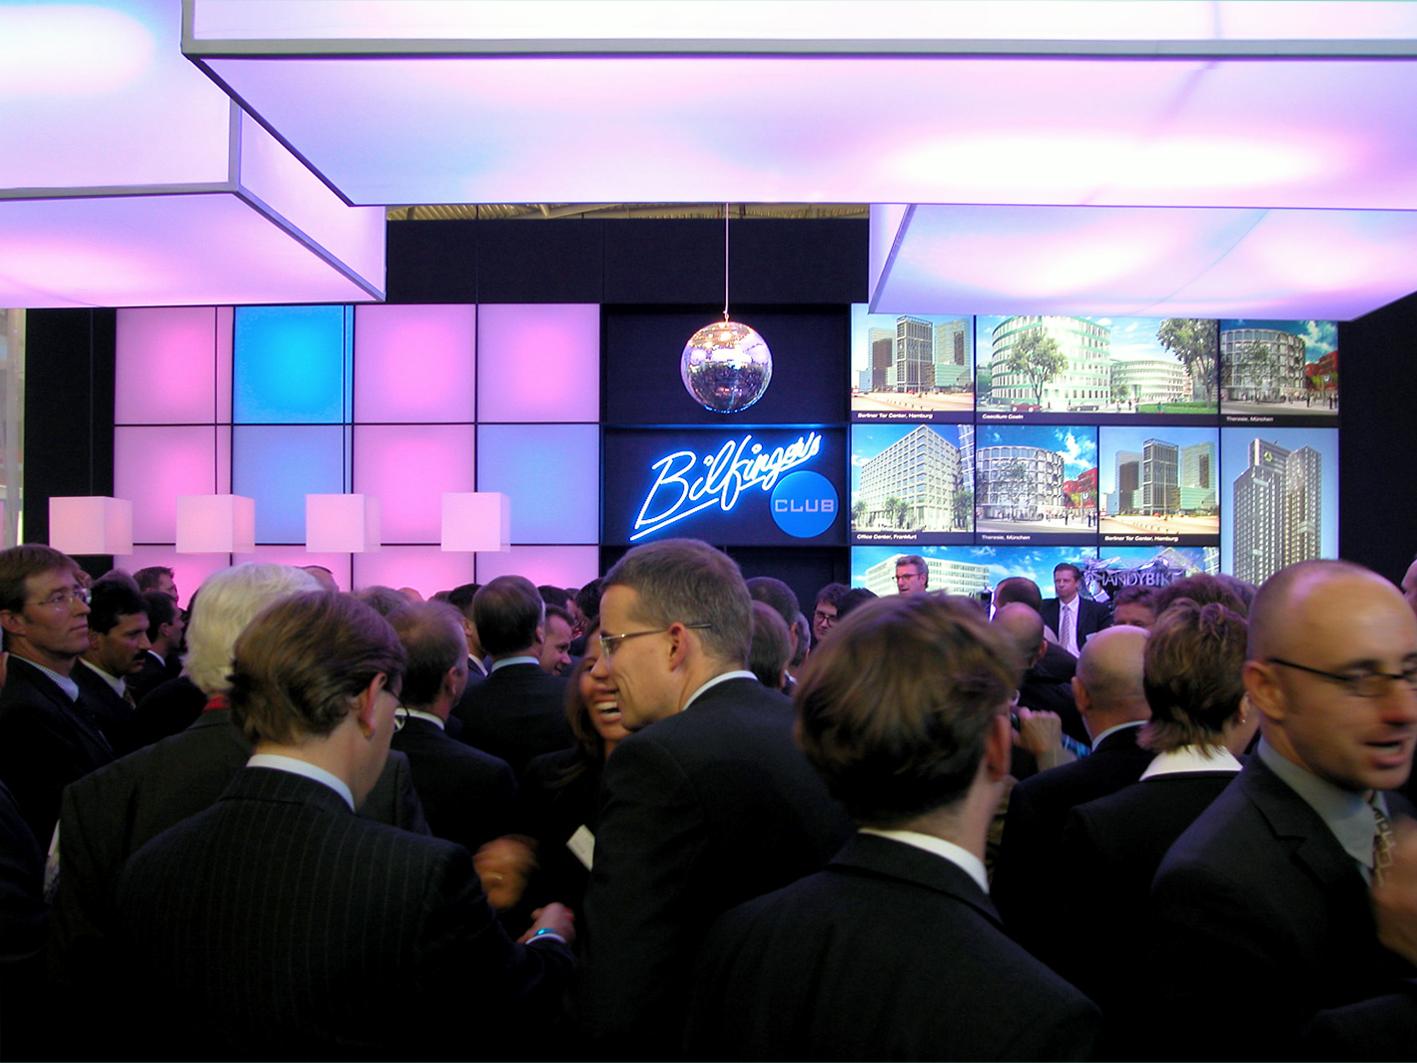 kwod_Messestand_ExpoReal_Bilfinger_Berger_Event_